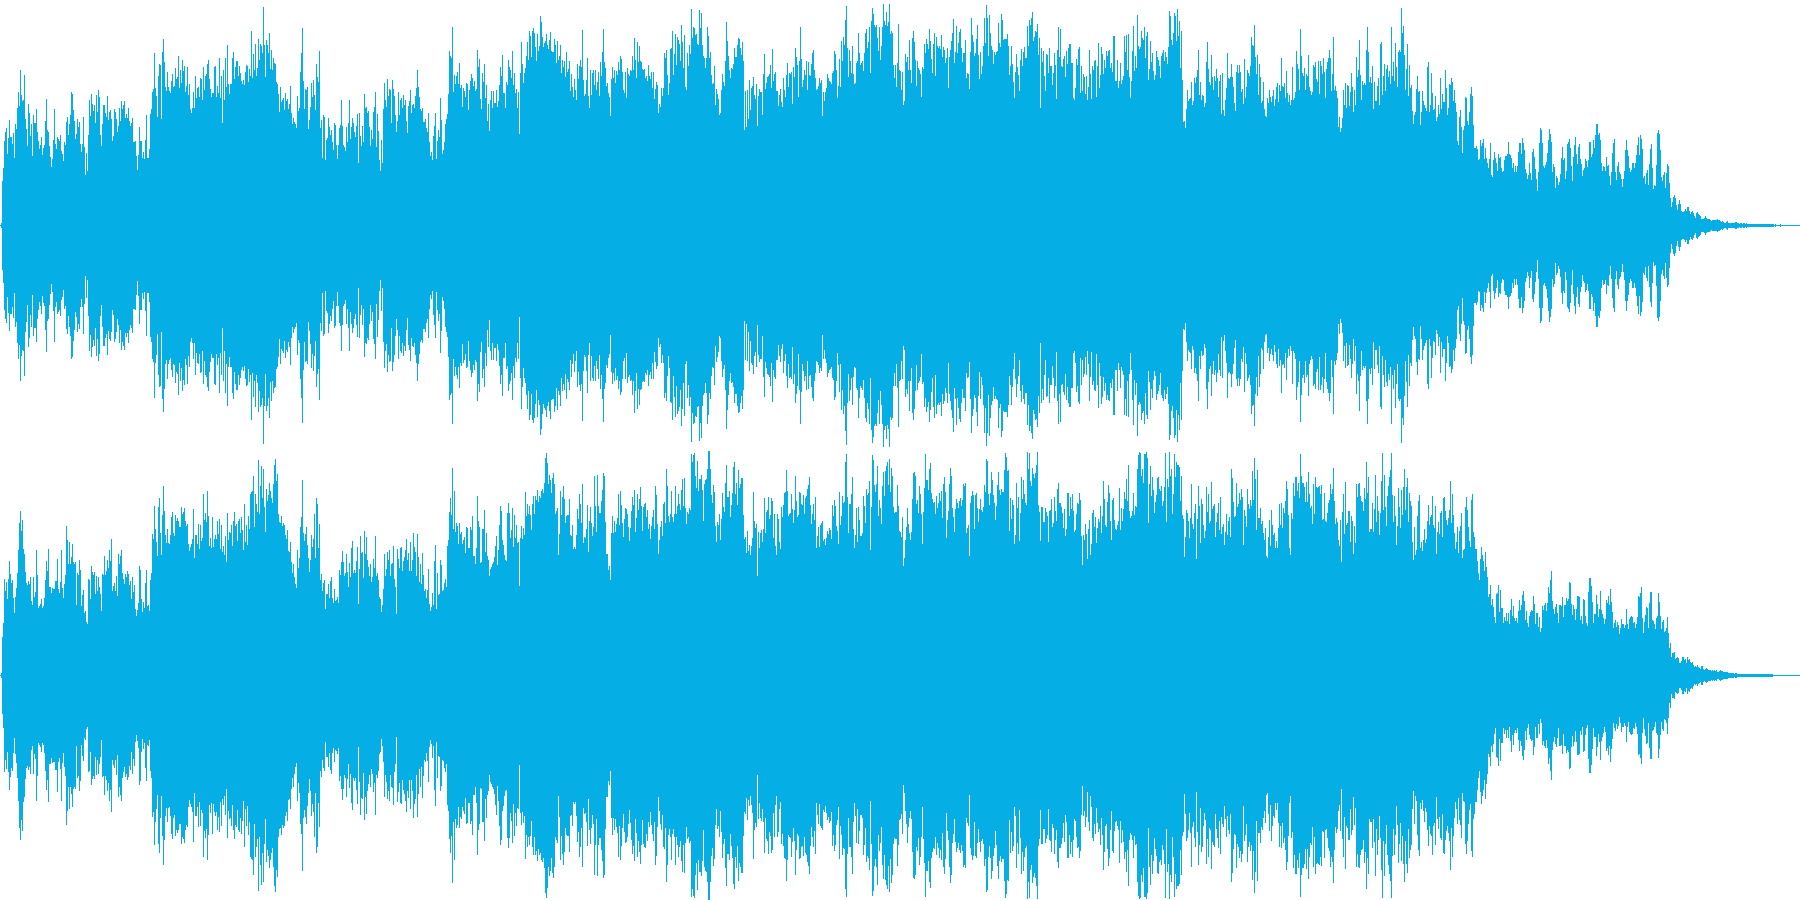 RPGのお城の式典をイメージしたBGMの再生済みの波形